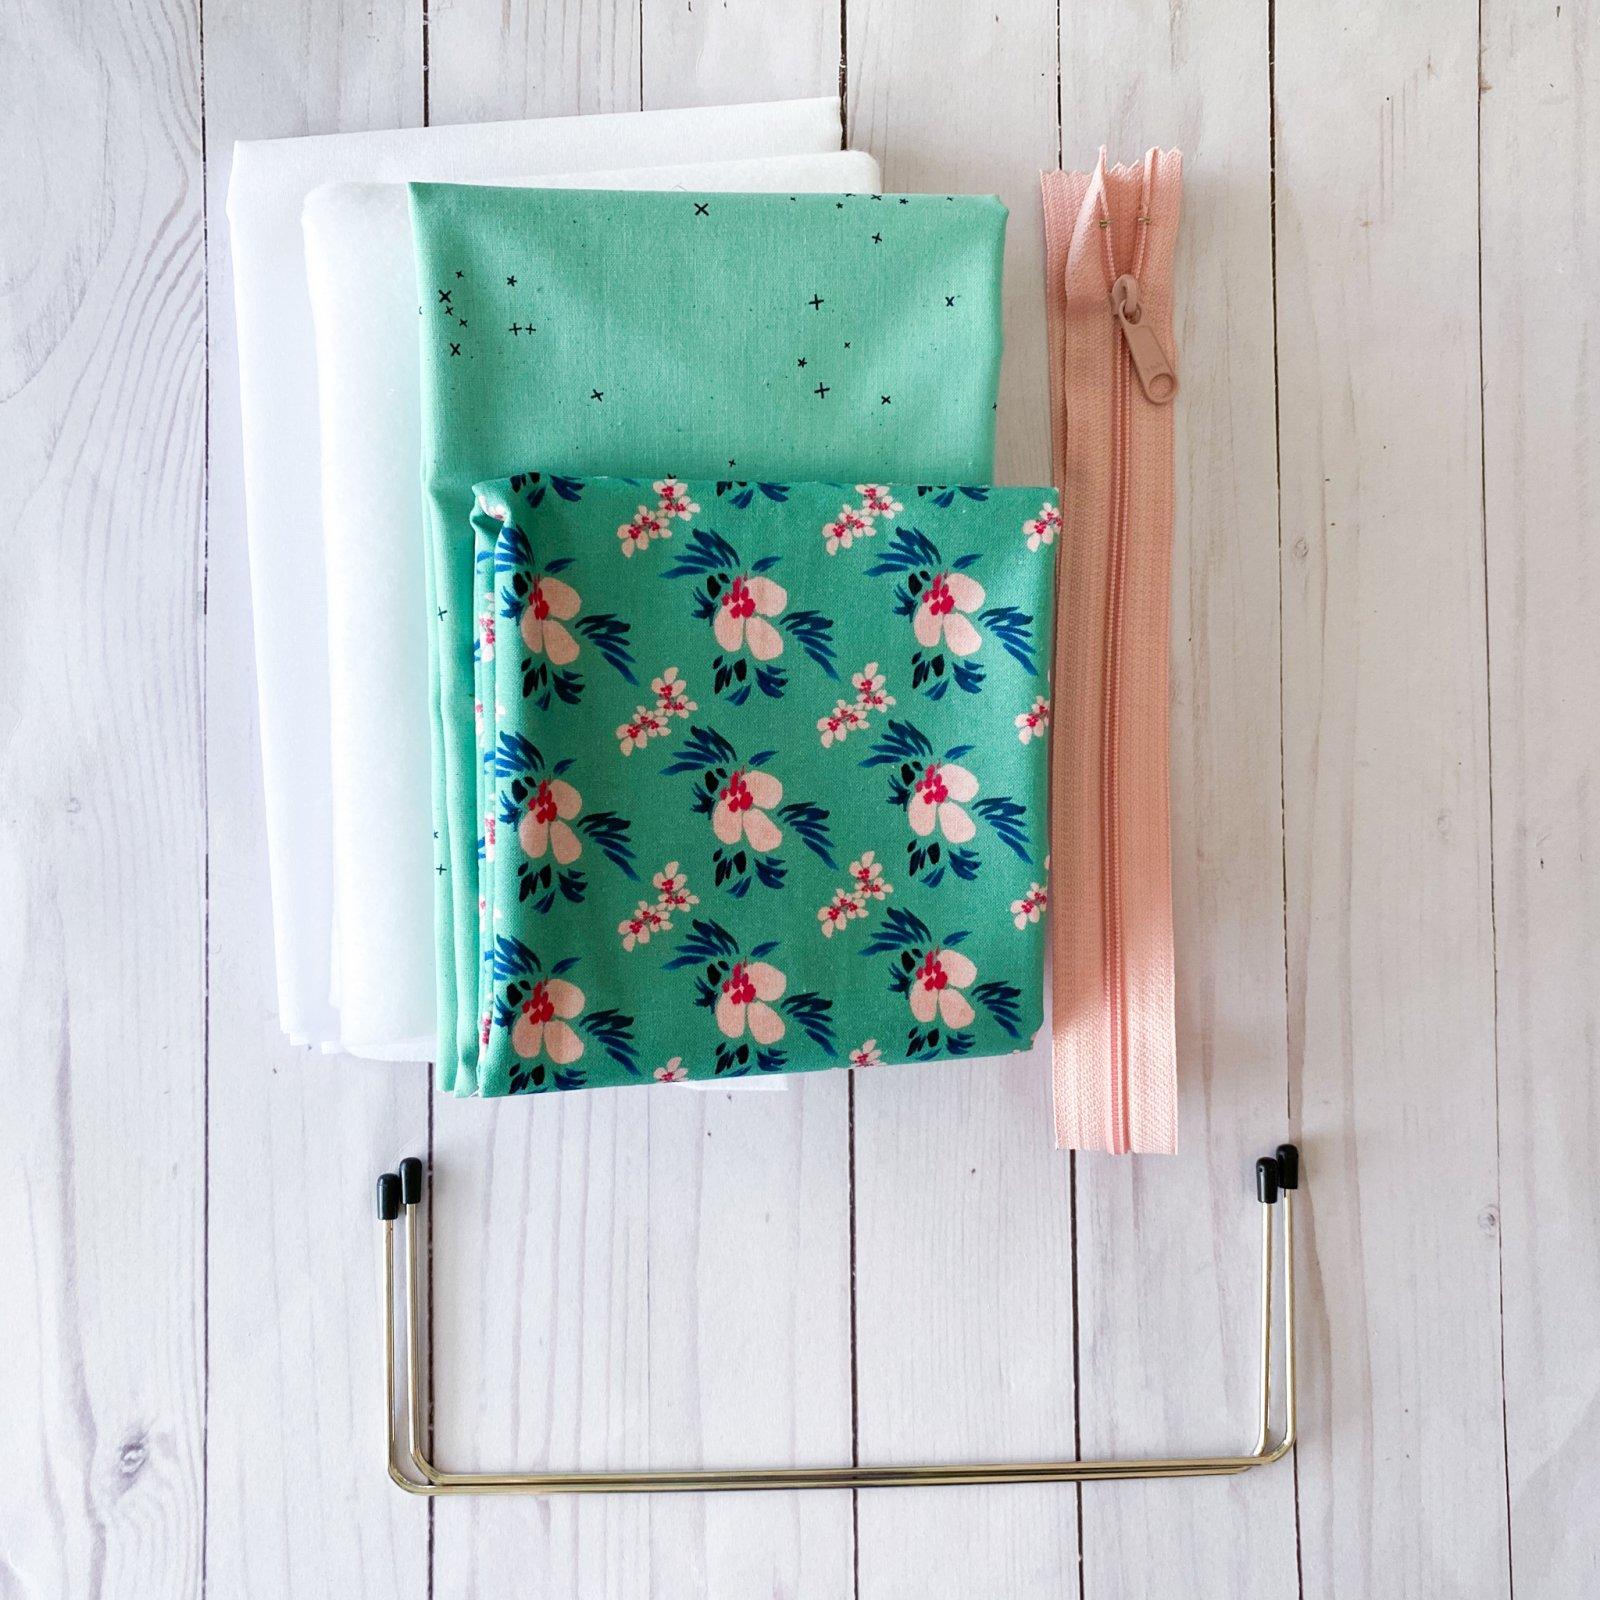 Retreat Bag Kit - Large Pouch - Urban Jungle